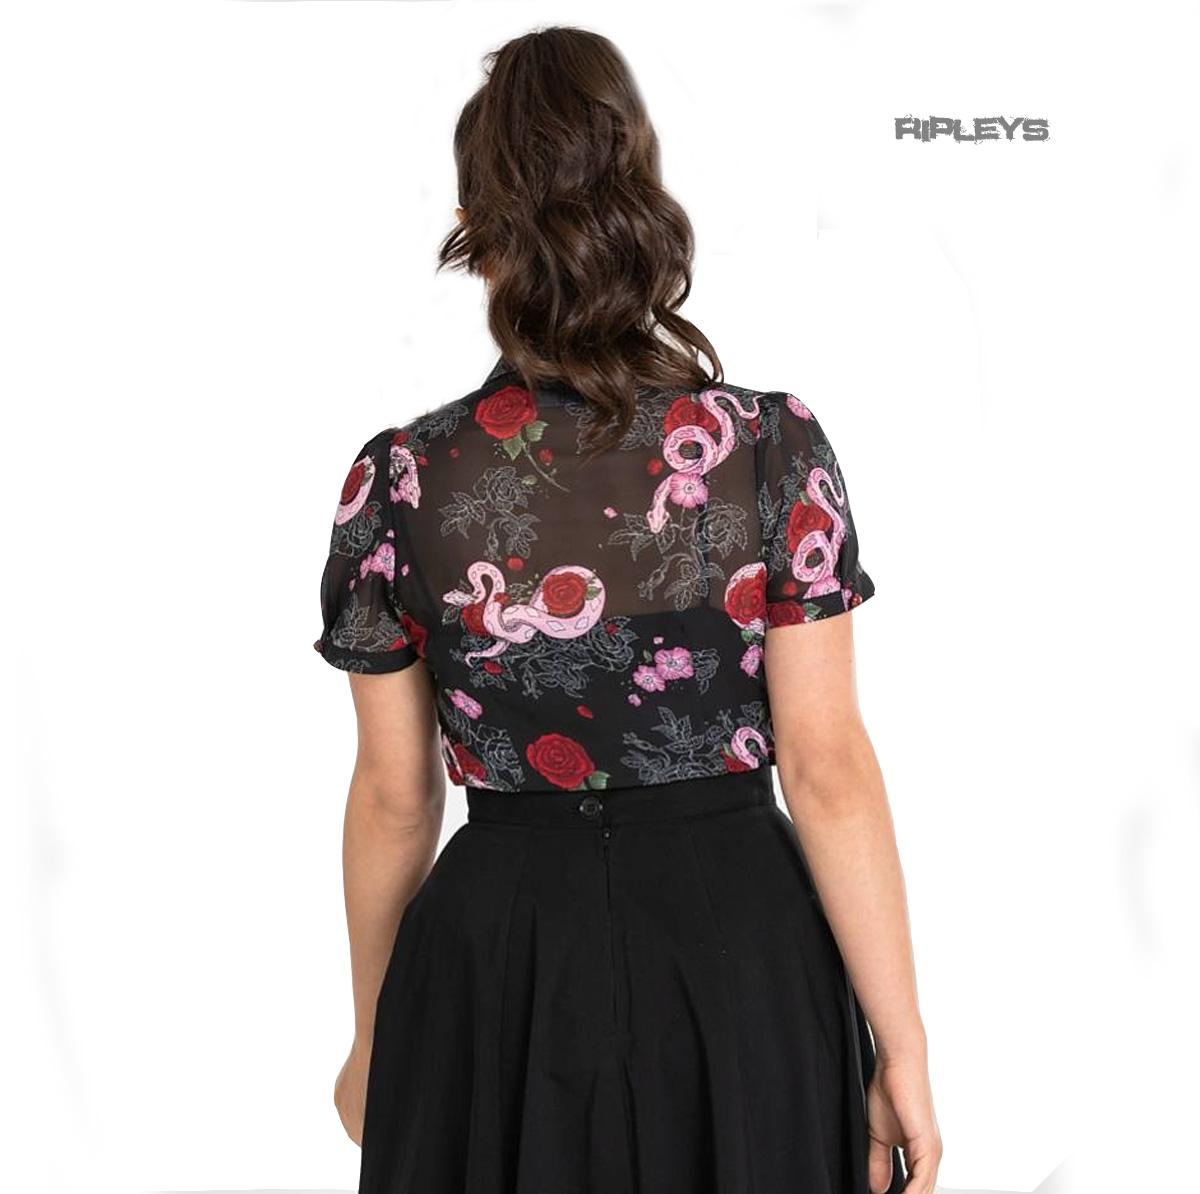 Hell-Bunny-Shirt-Gothic-Black-Top-MEDUSA-Blouse-Snakes-amp-Roses-All-Sizes thumbnail 22